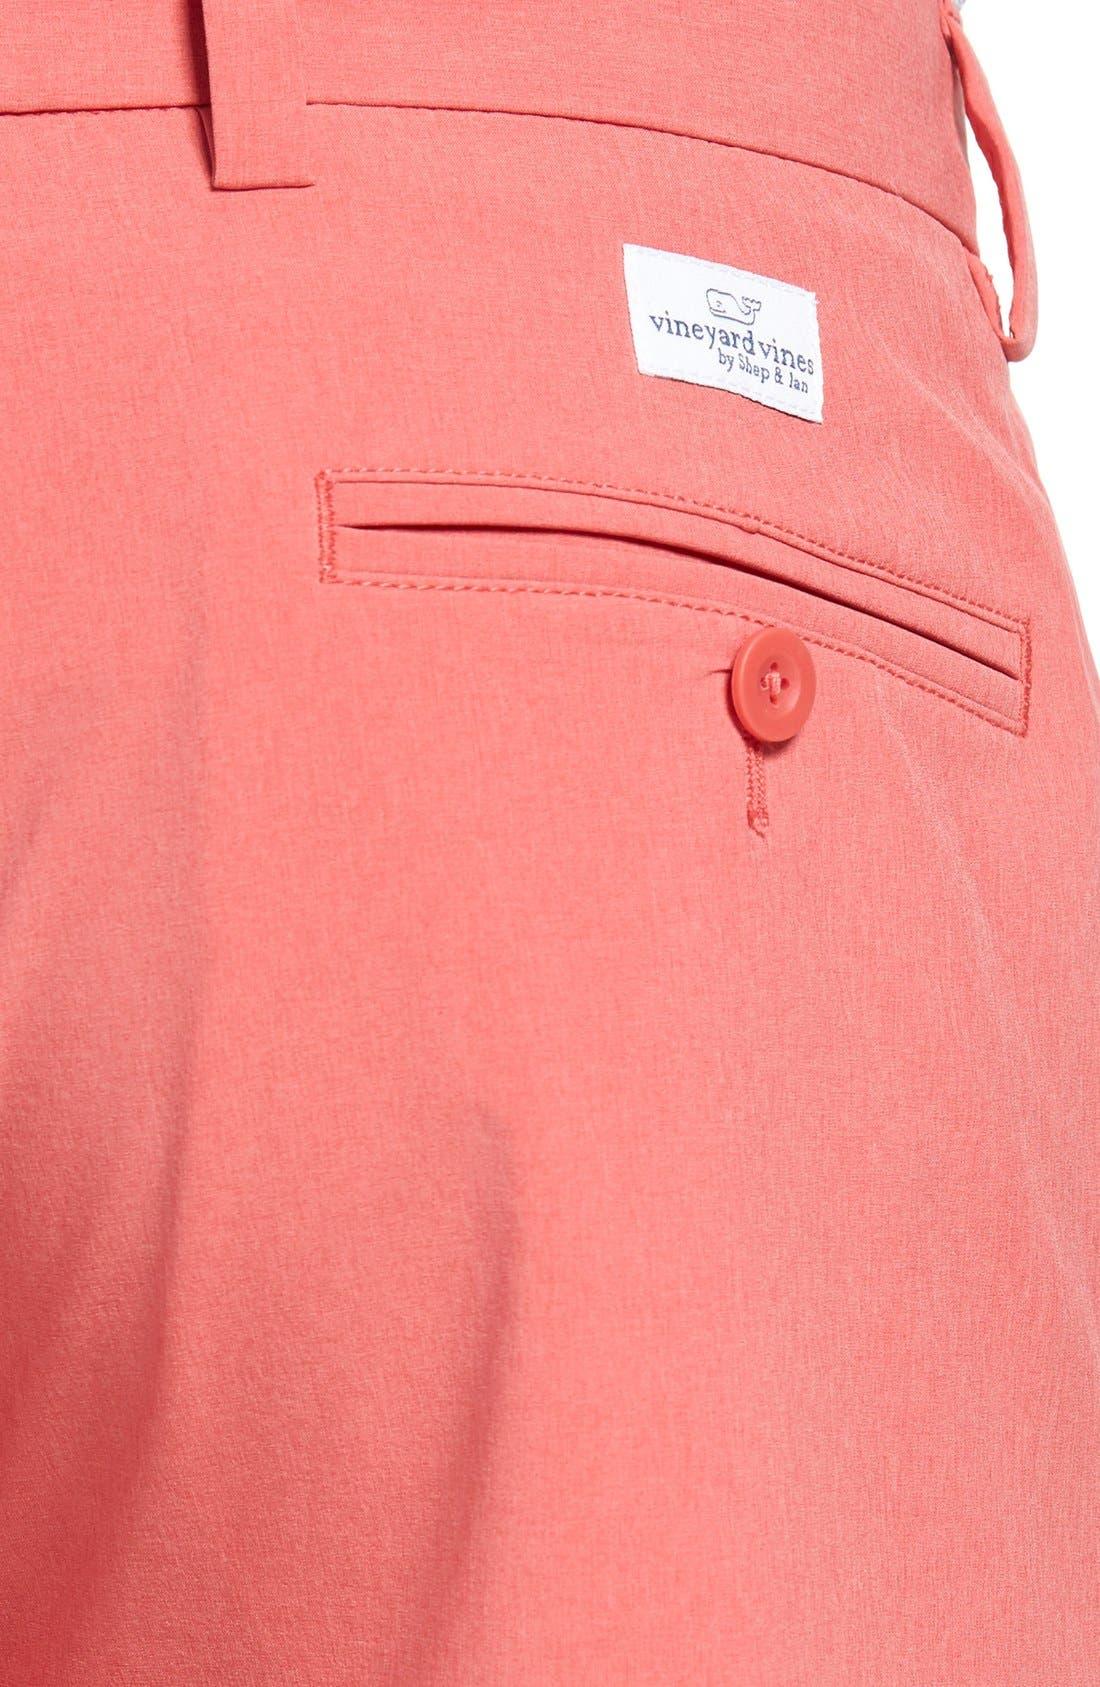 8 Inch Performance Breaker Shorts,                             Alternate thumbnail 72, color,